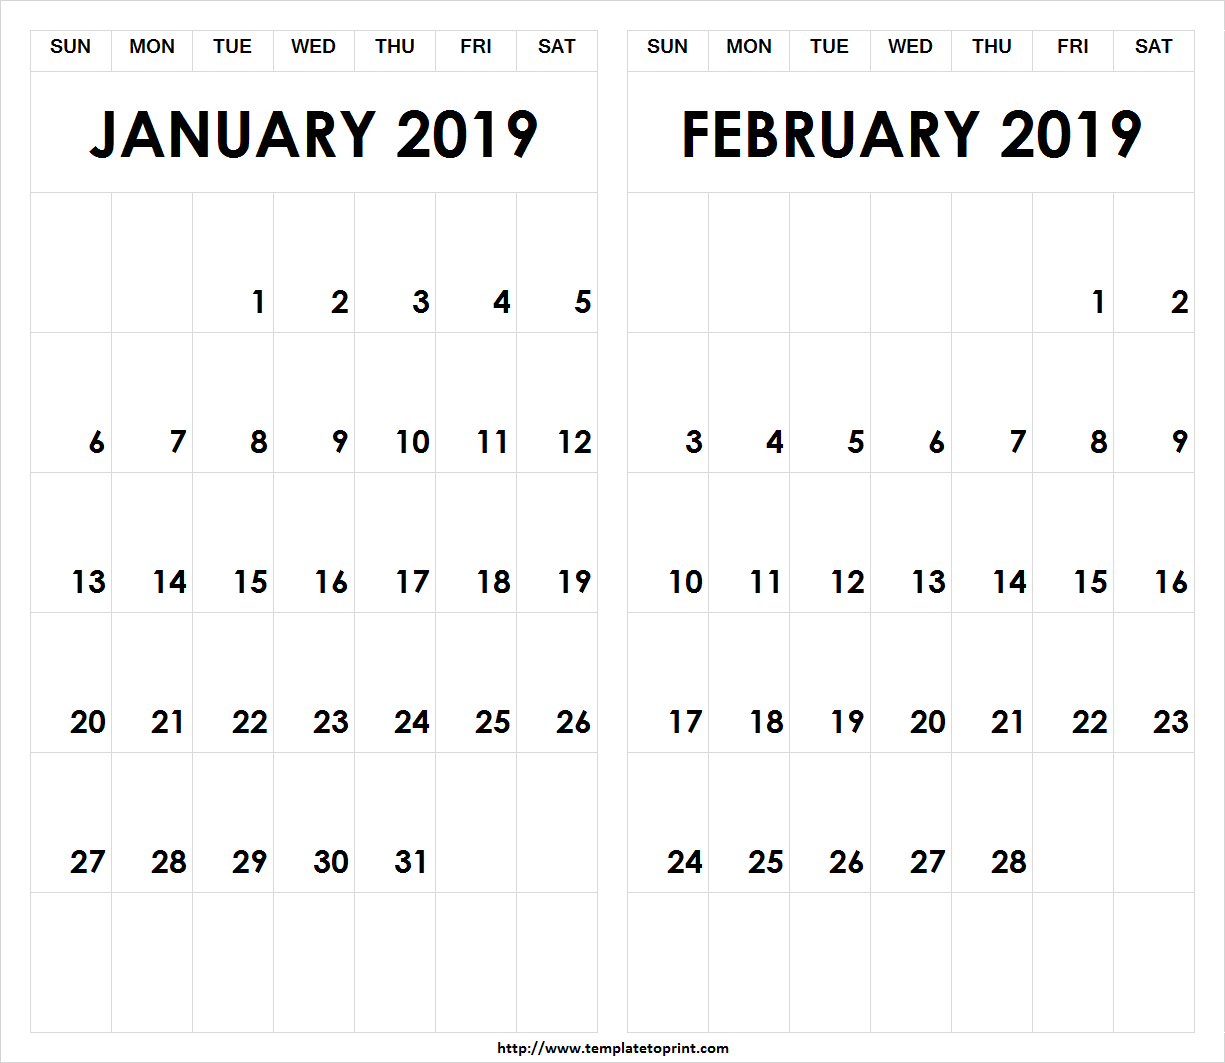 Printable-2019-January-February-Calendar » Template To Print Calendar 2019 January And February